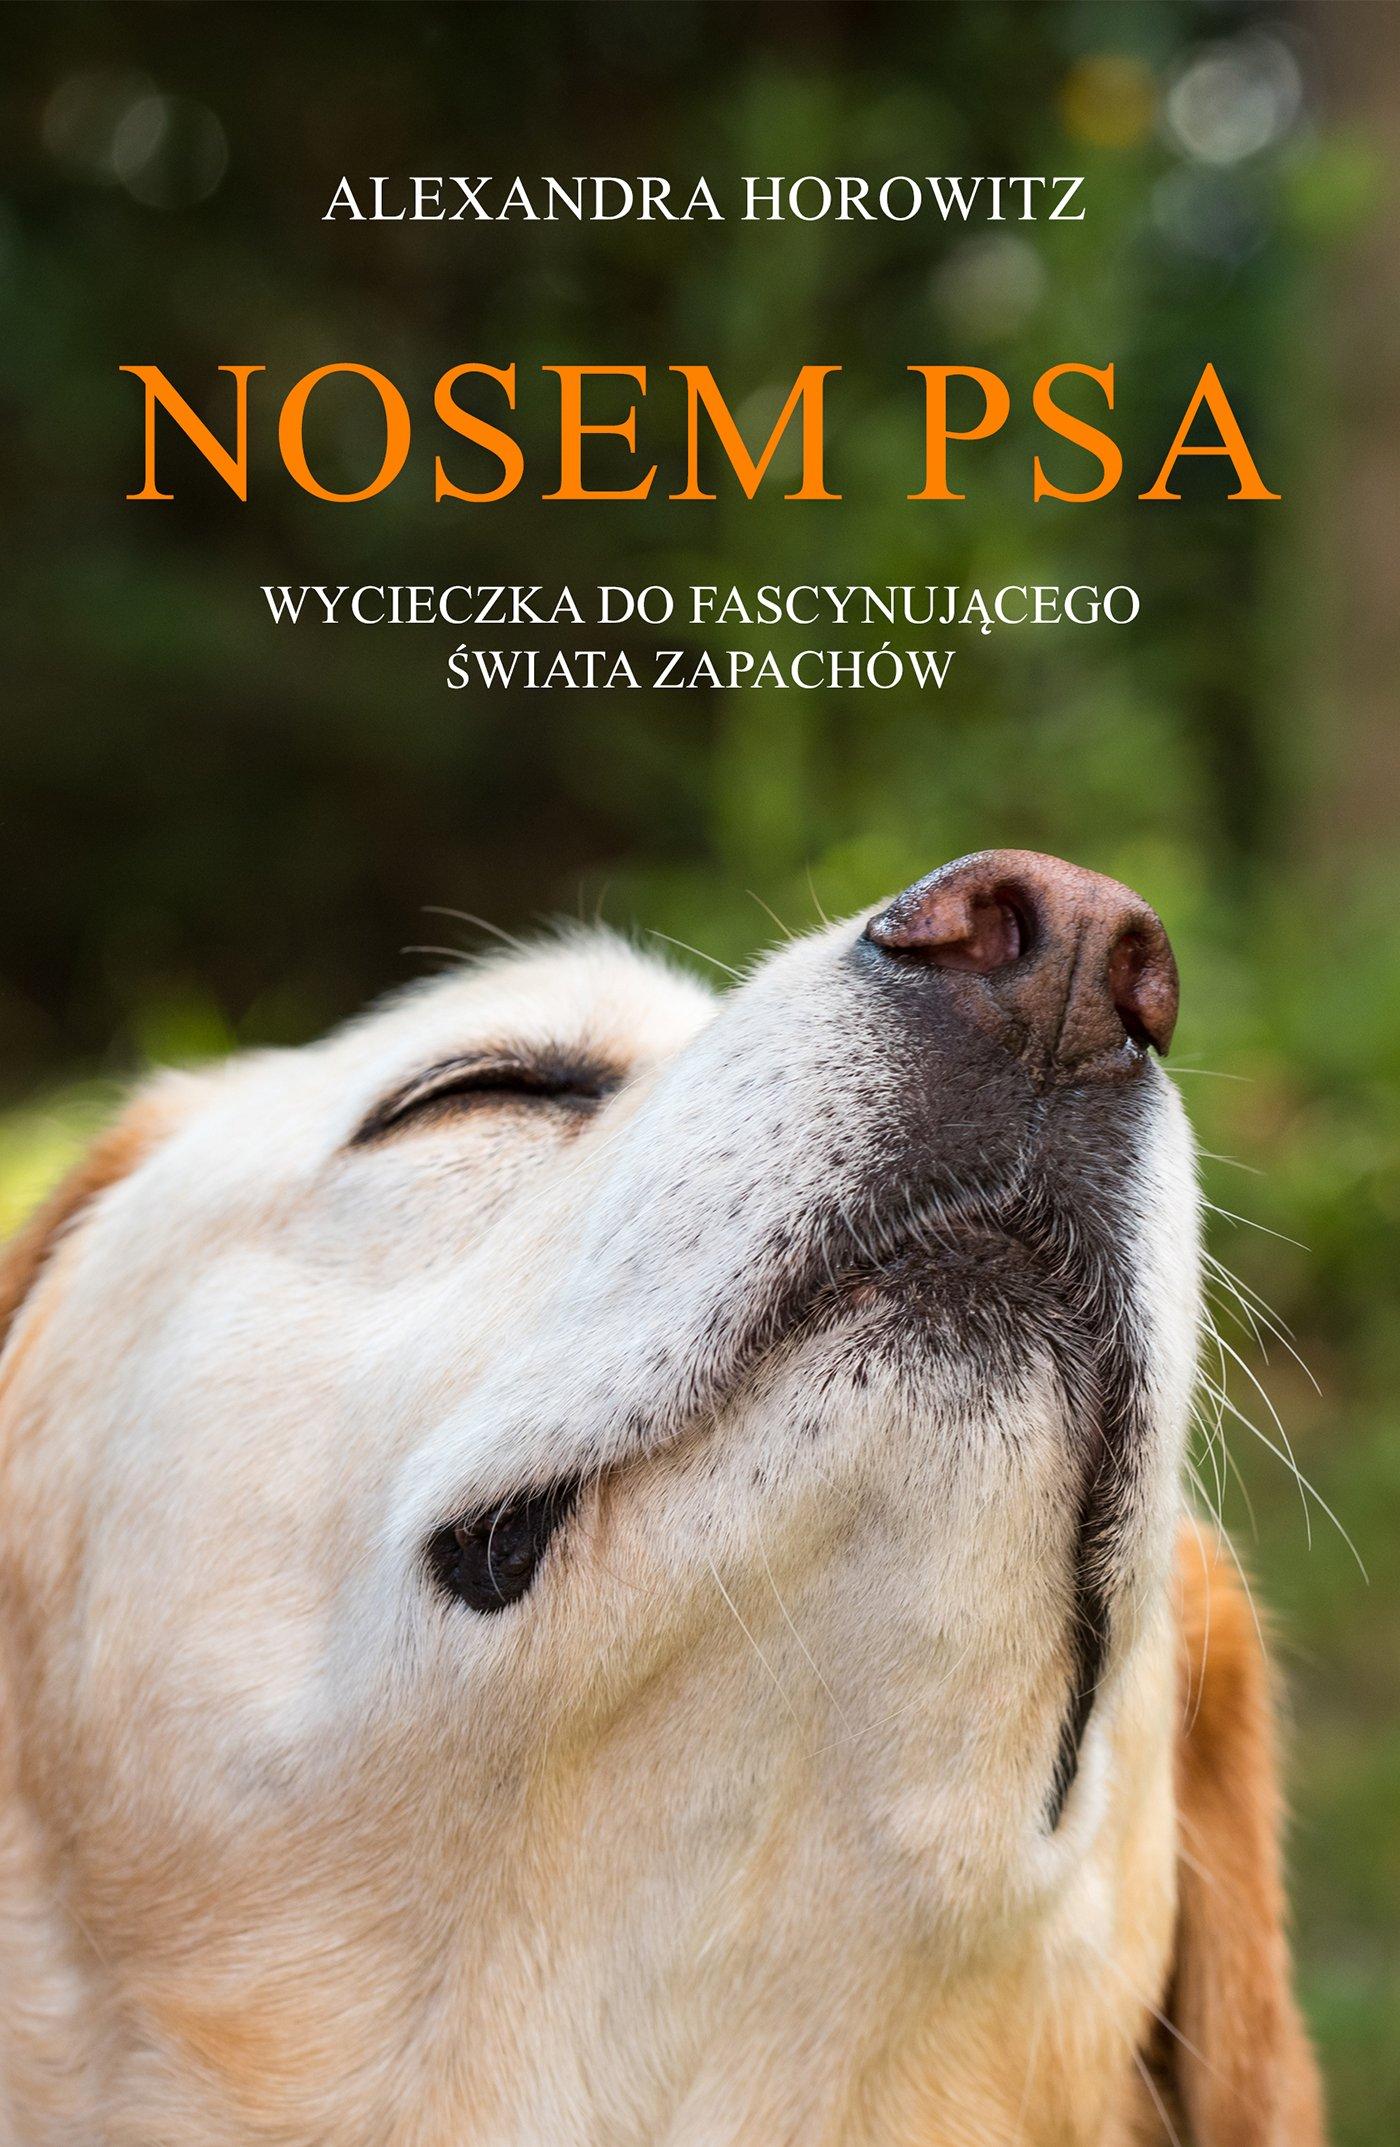 Nosem psa - Ebook (Książka na Kindle) do pobrania w formacie MOBI